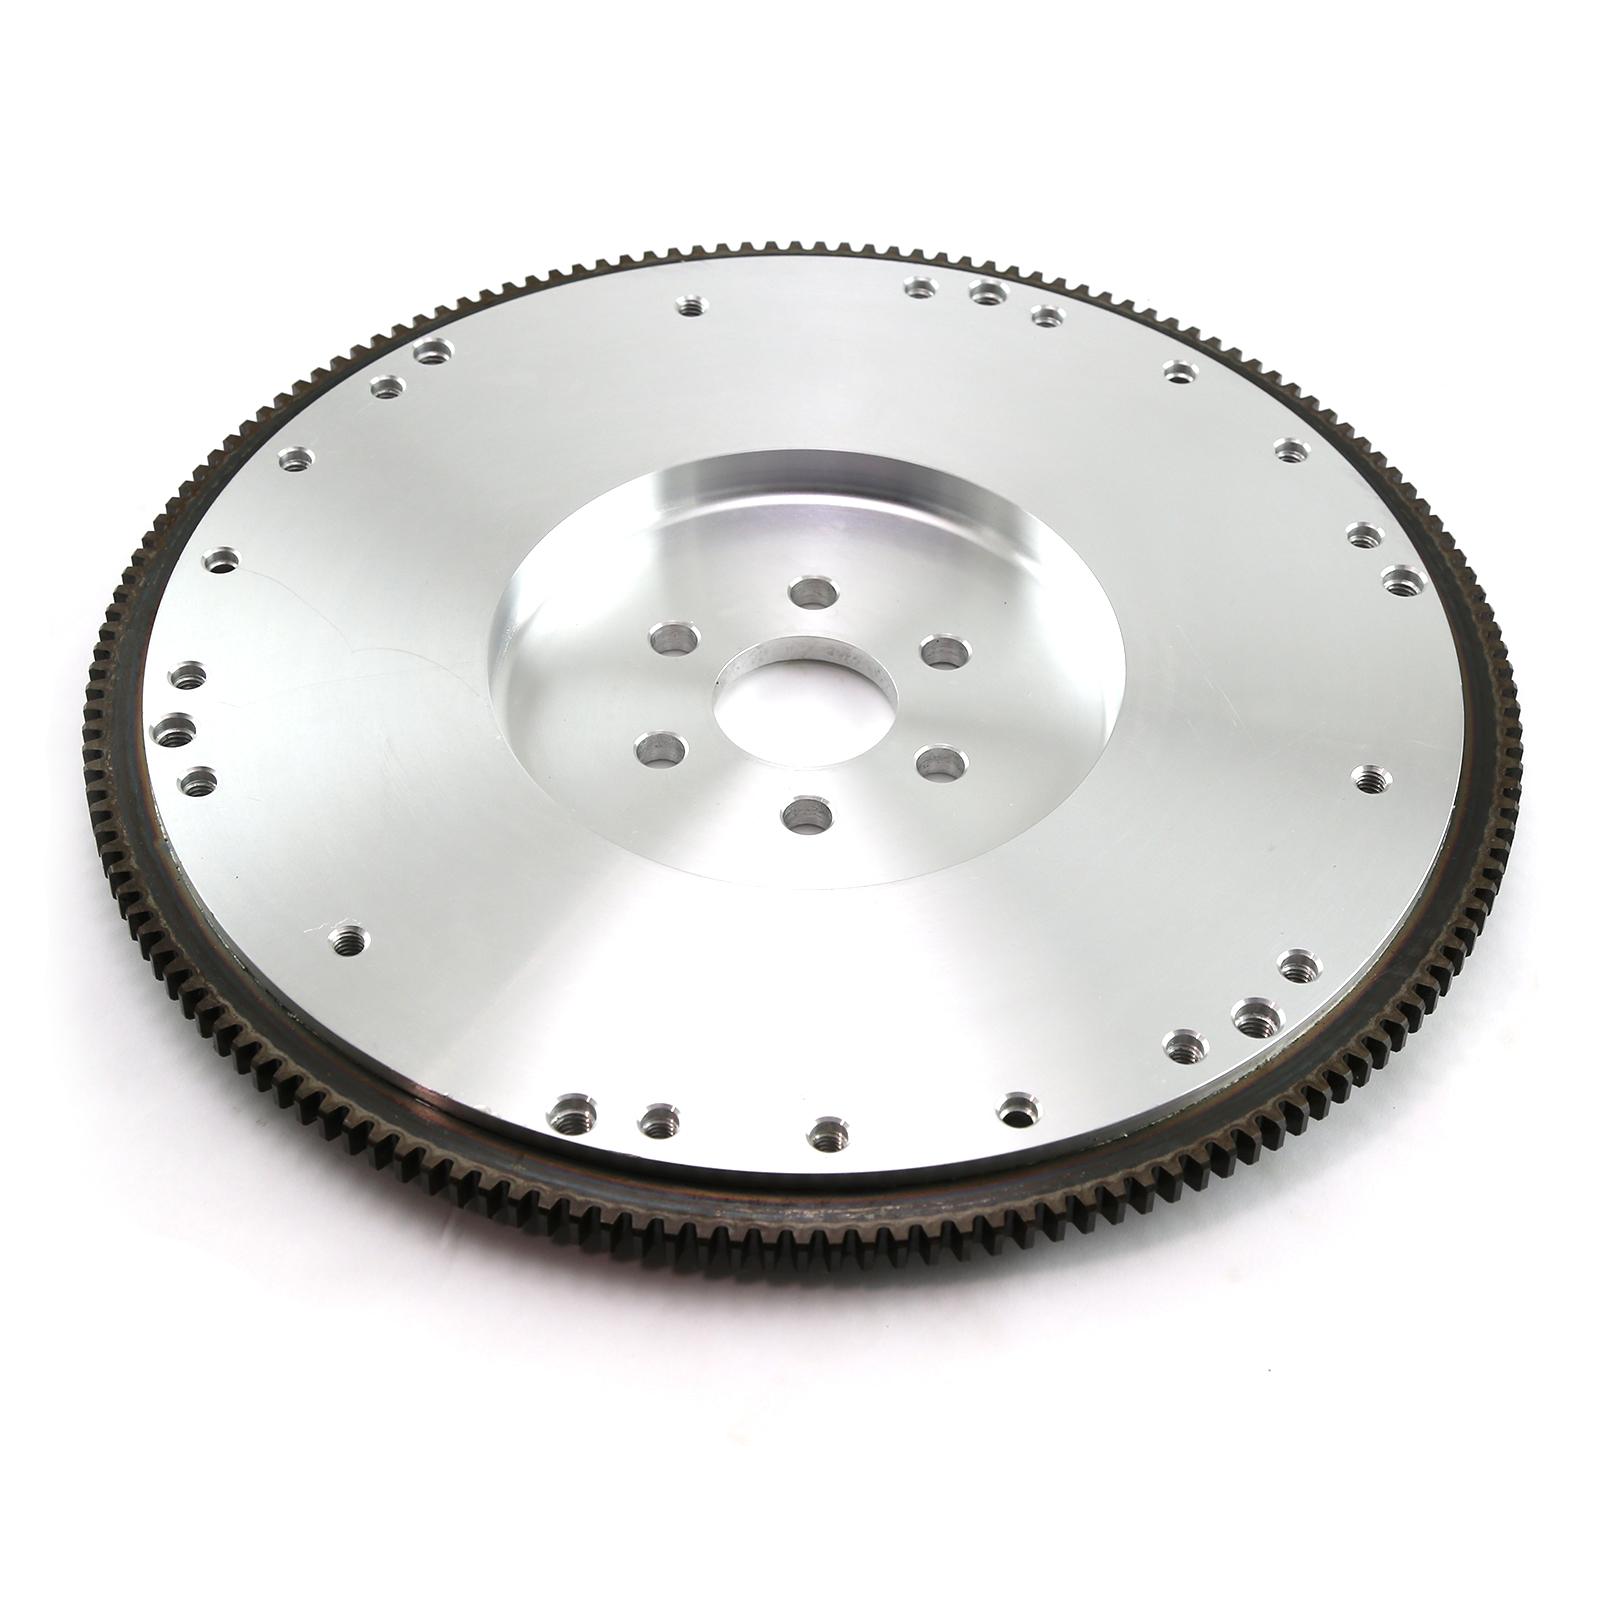 Ford SB 289 302 351 351C Windsor 157 Tooth Int. Bal Billet Aluminum Flywheel